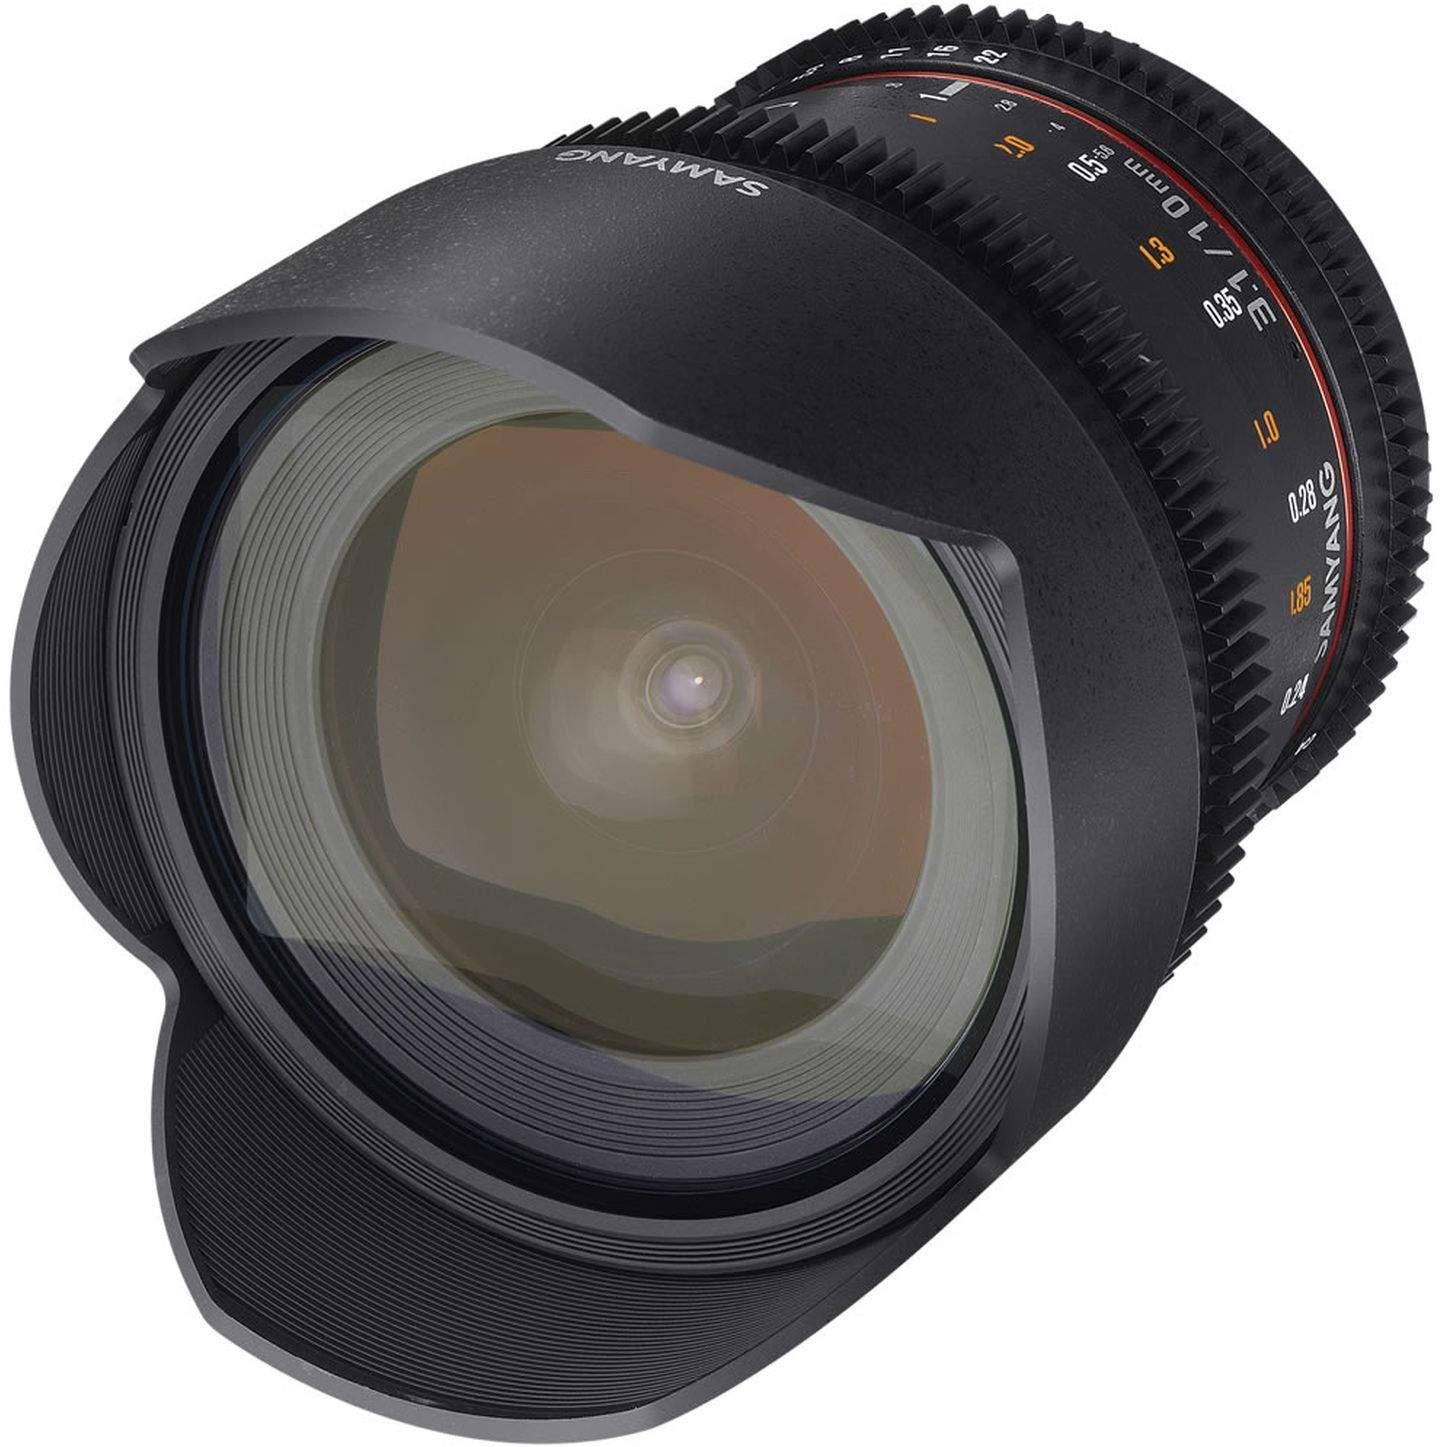 10mm T3.1 VDSLR UMC II APS-C (Lens for Pentax K) main image